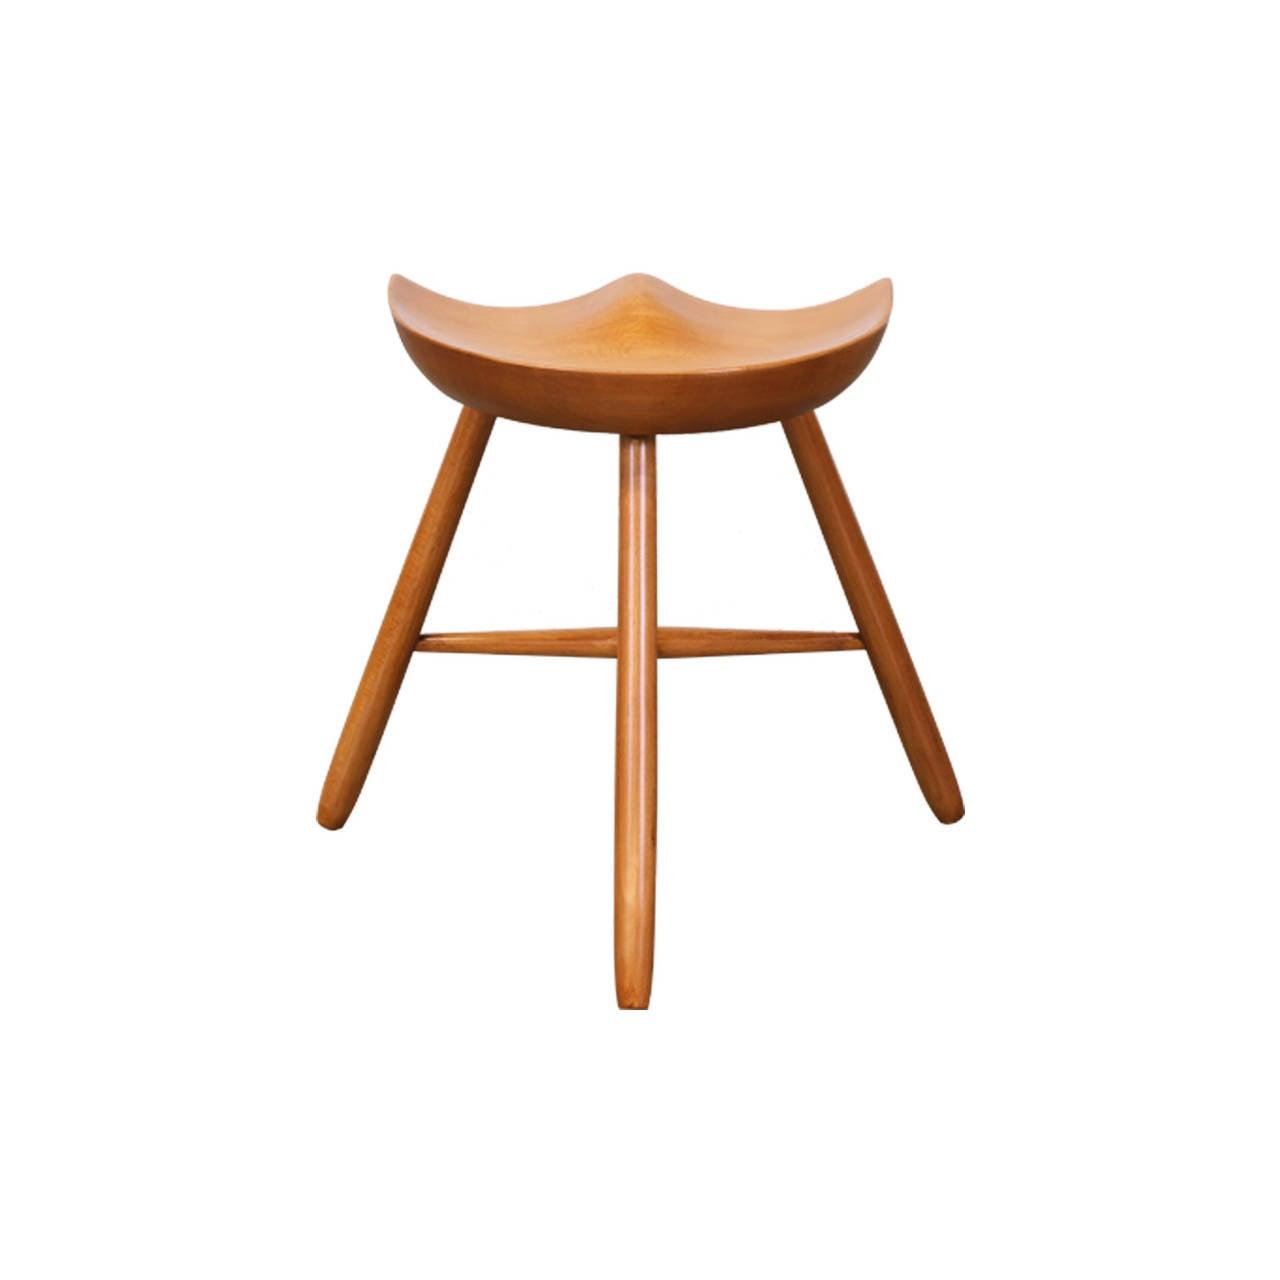 3 legged chair bedroom canada three milking stool after mogens lassen at 1stdibs